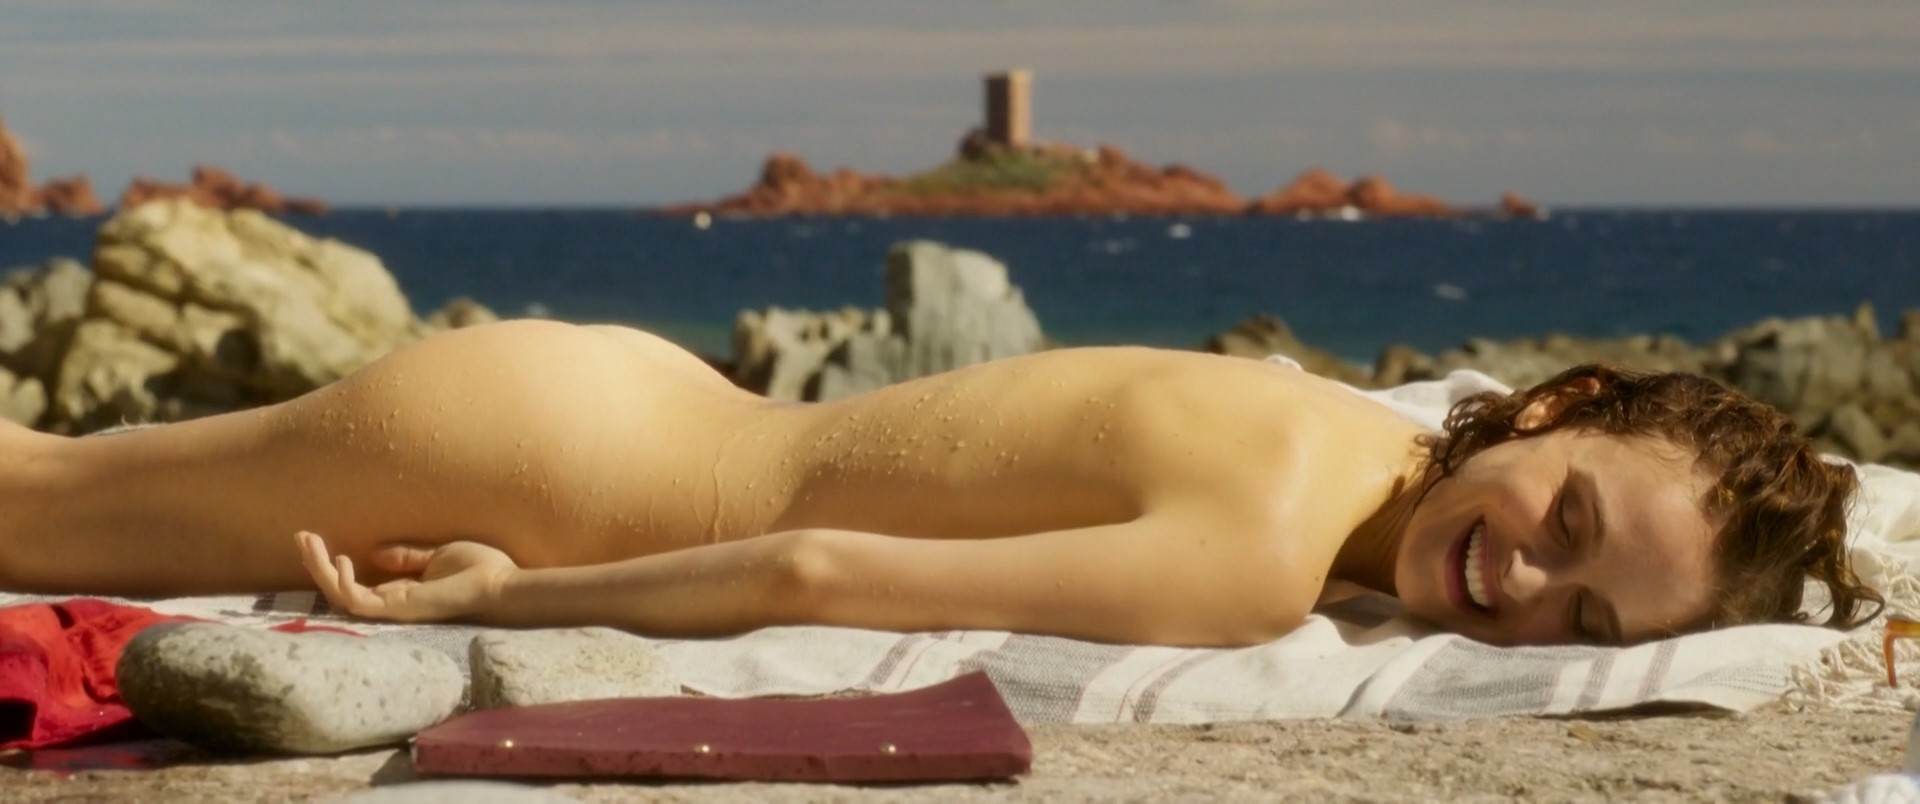 Ashley greene nude scenes